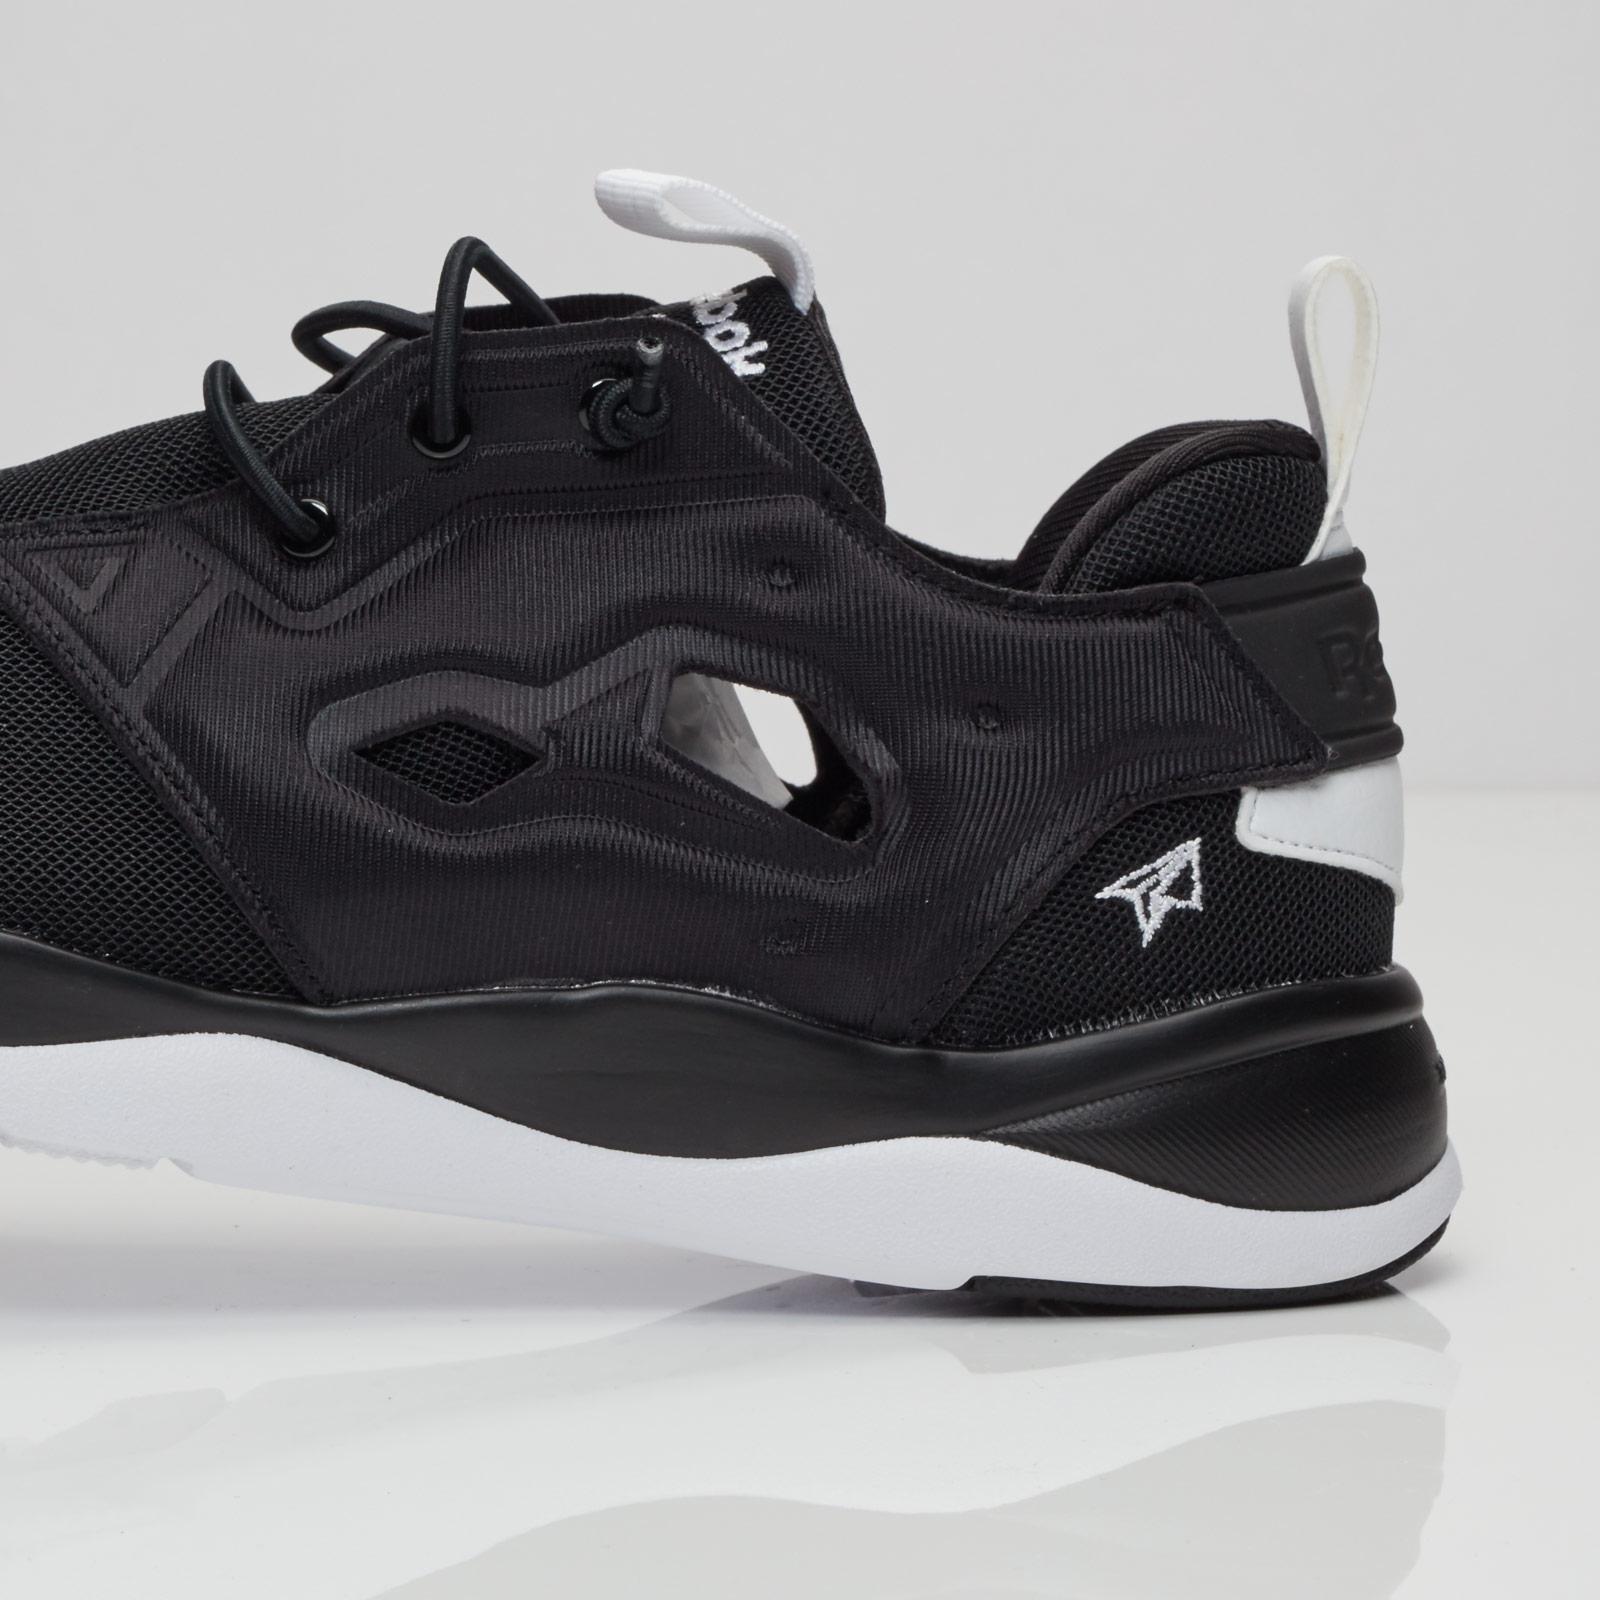 save off 131f2 bf290 Reebok Furylite AFF TXT Stay Real - Bd1092 - Sneakersnstuff   sneakers    streetwear online since 1999